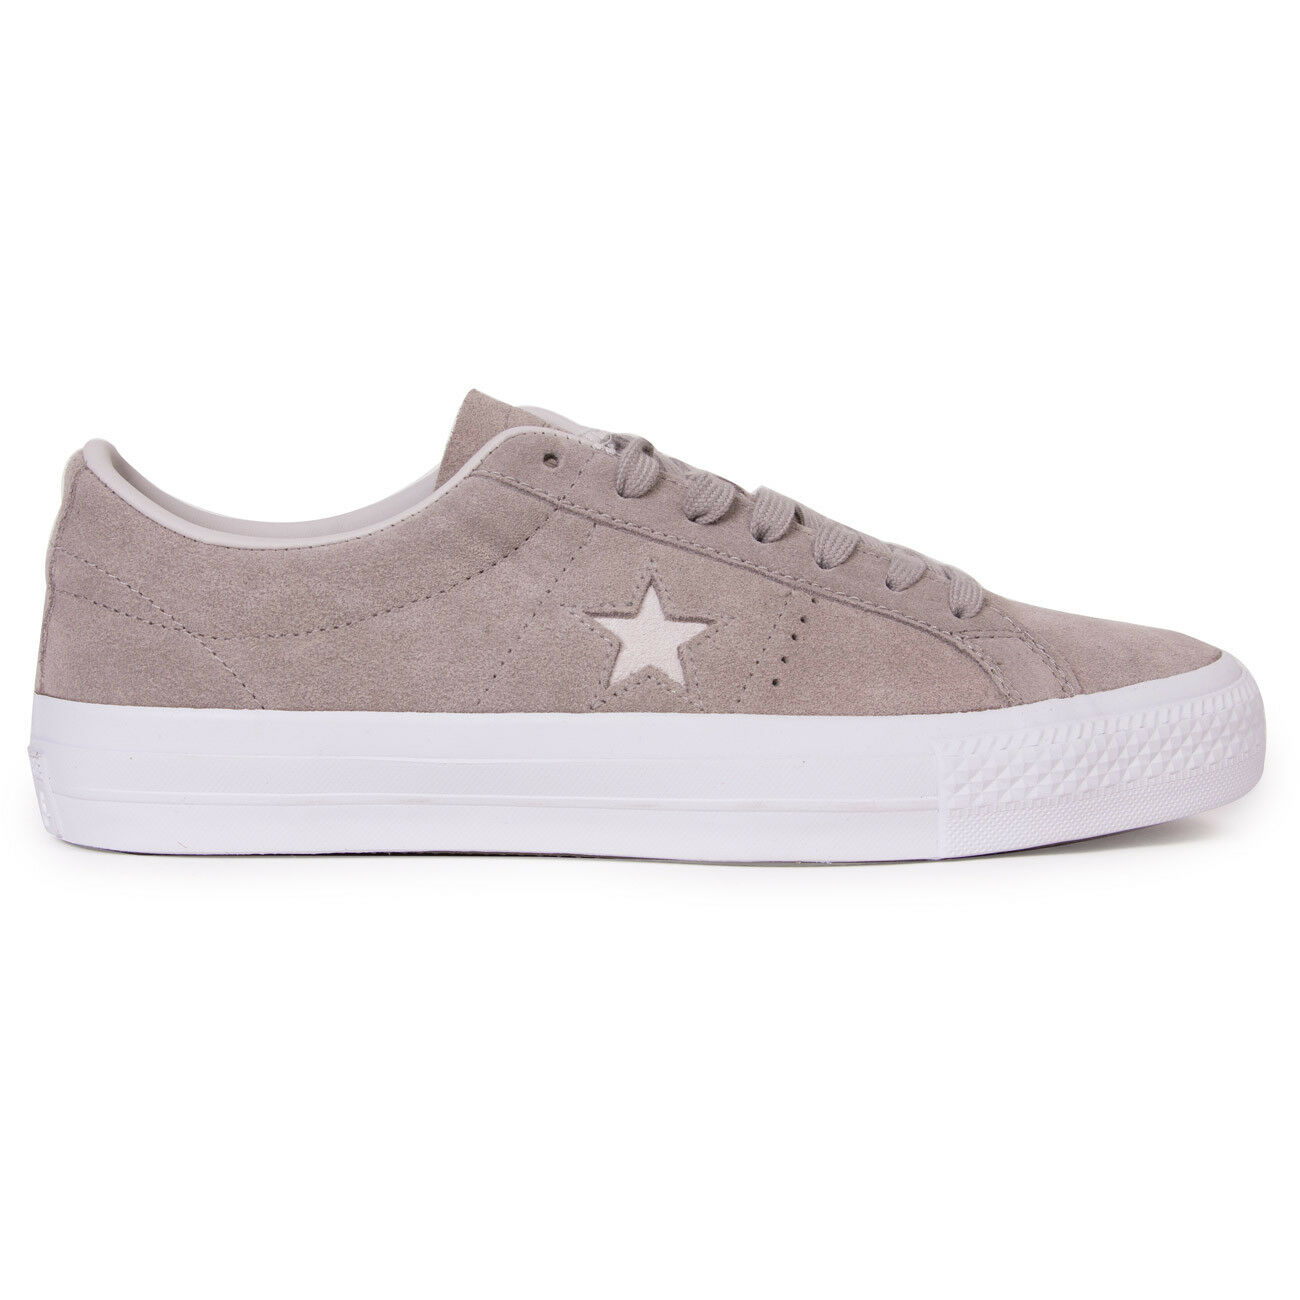 Converse Herren Sneaker One Star Pro Ox